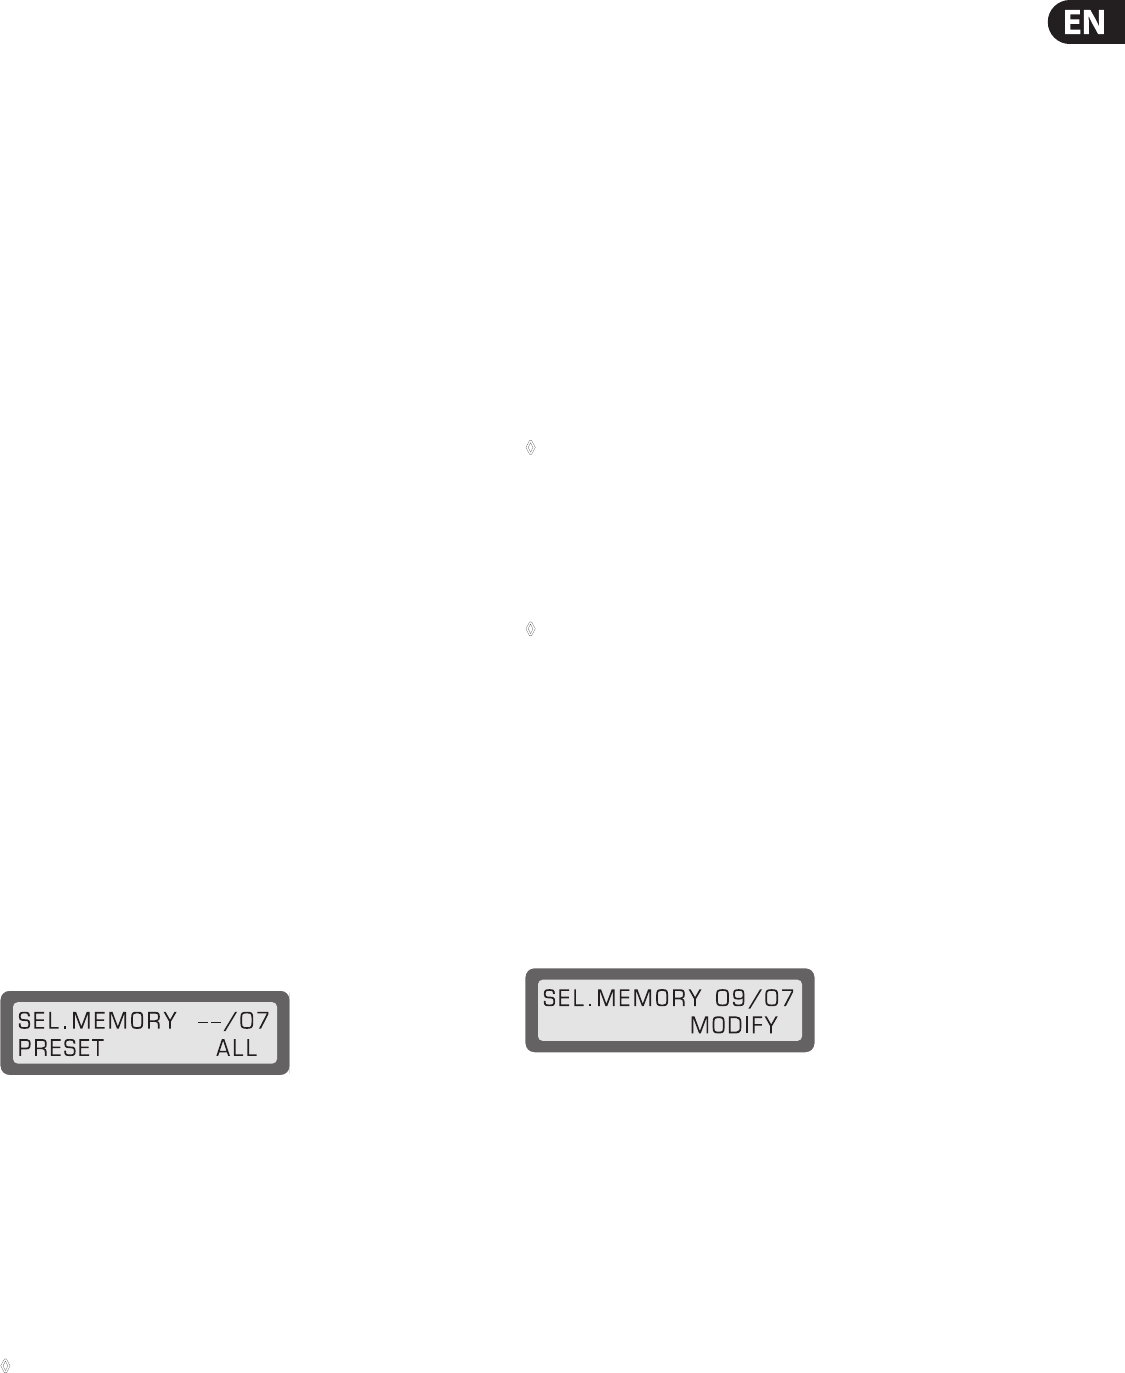 4b521b02a236 Behringer Eurolight Lc2412 Users Manual